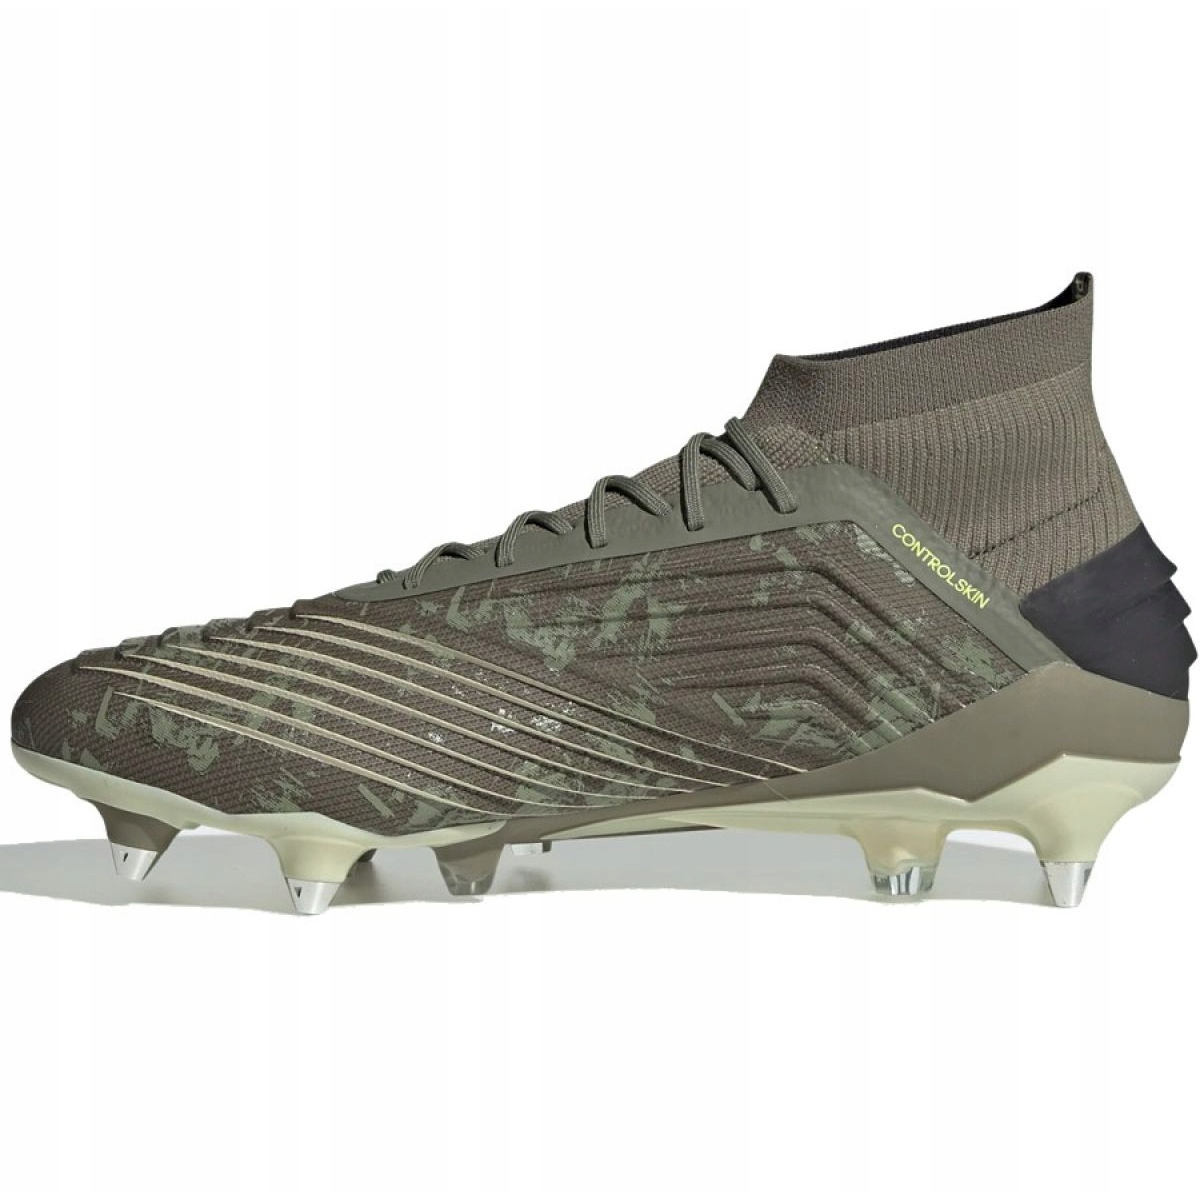 Buty piłkarskie adidas Predator 19.1 Sg M EF8206 szare szarysrebrny